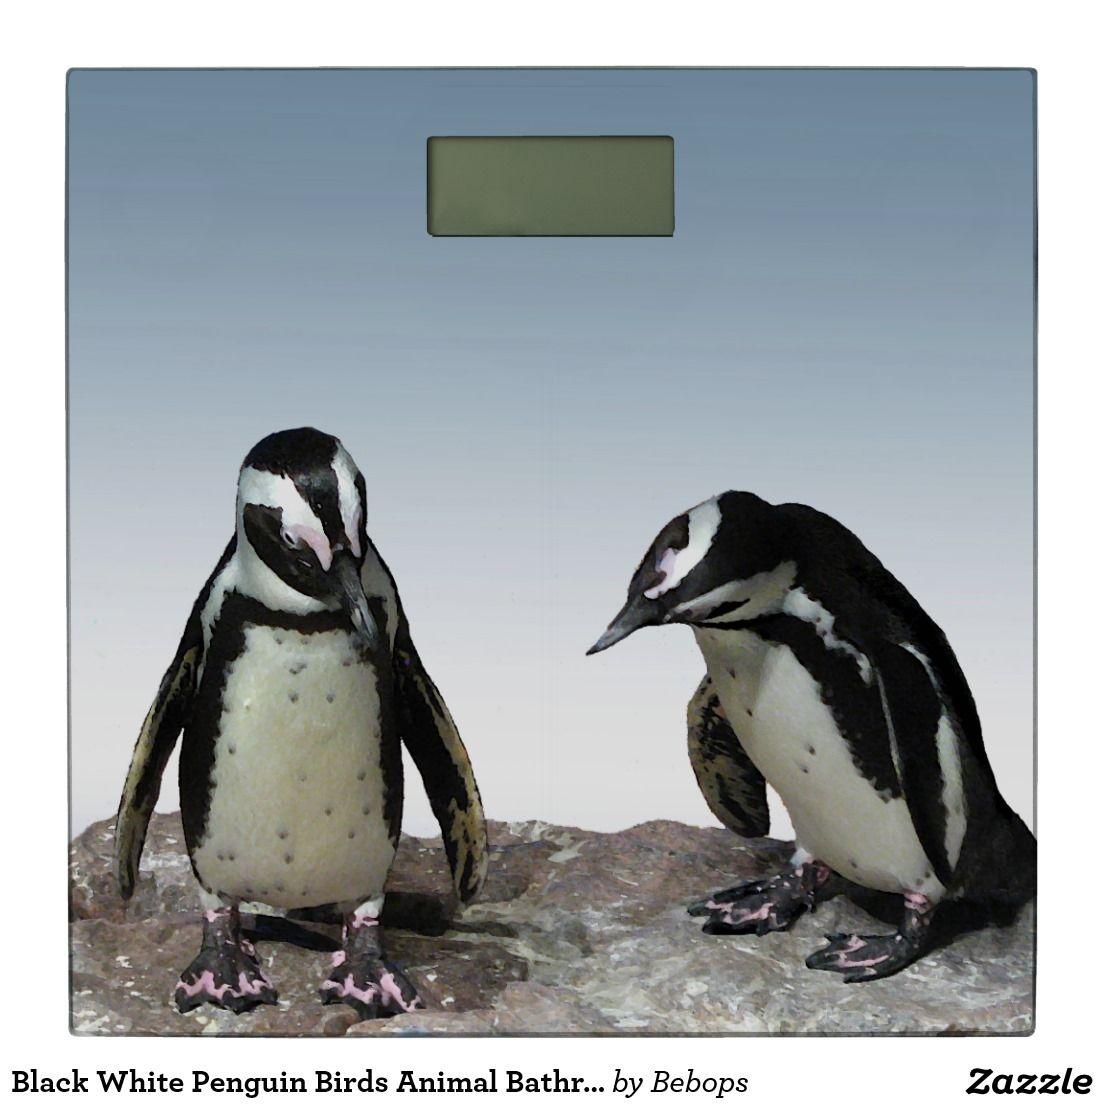 Black White Penguin Birds Animal Bathroom Scale Zazzle